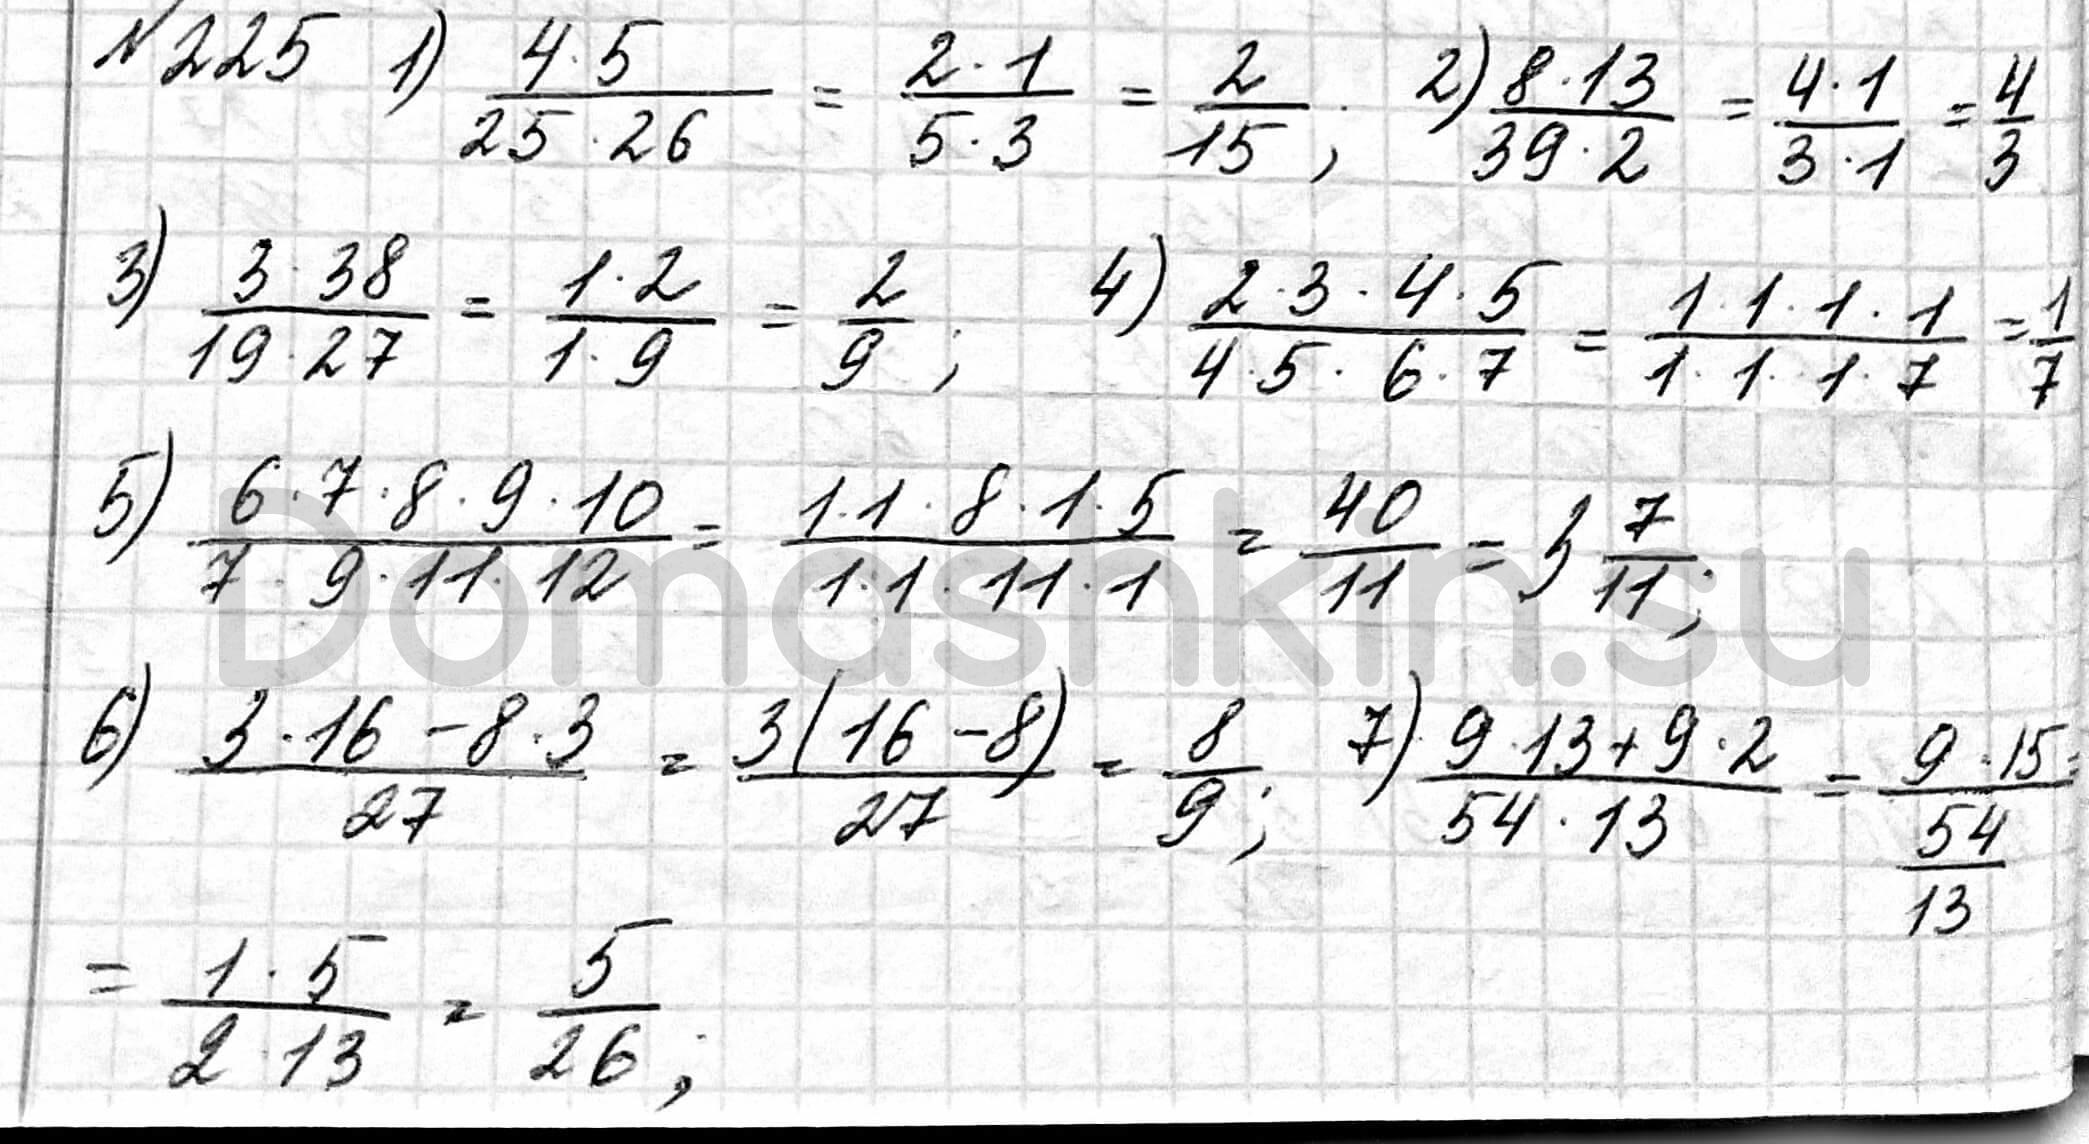 Математика 6 класс учебник Мерзляк номер 225 решение